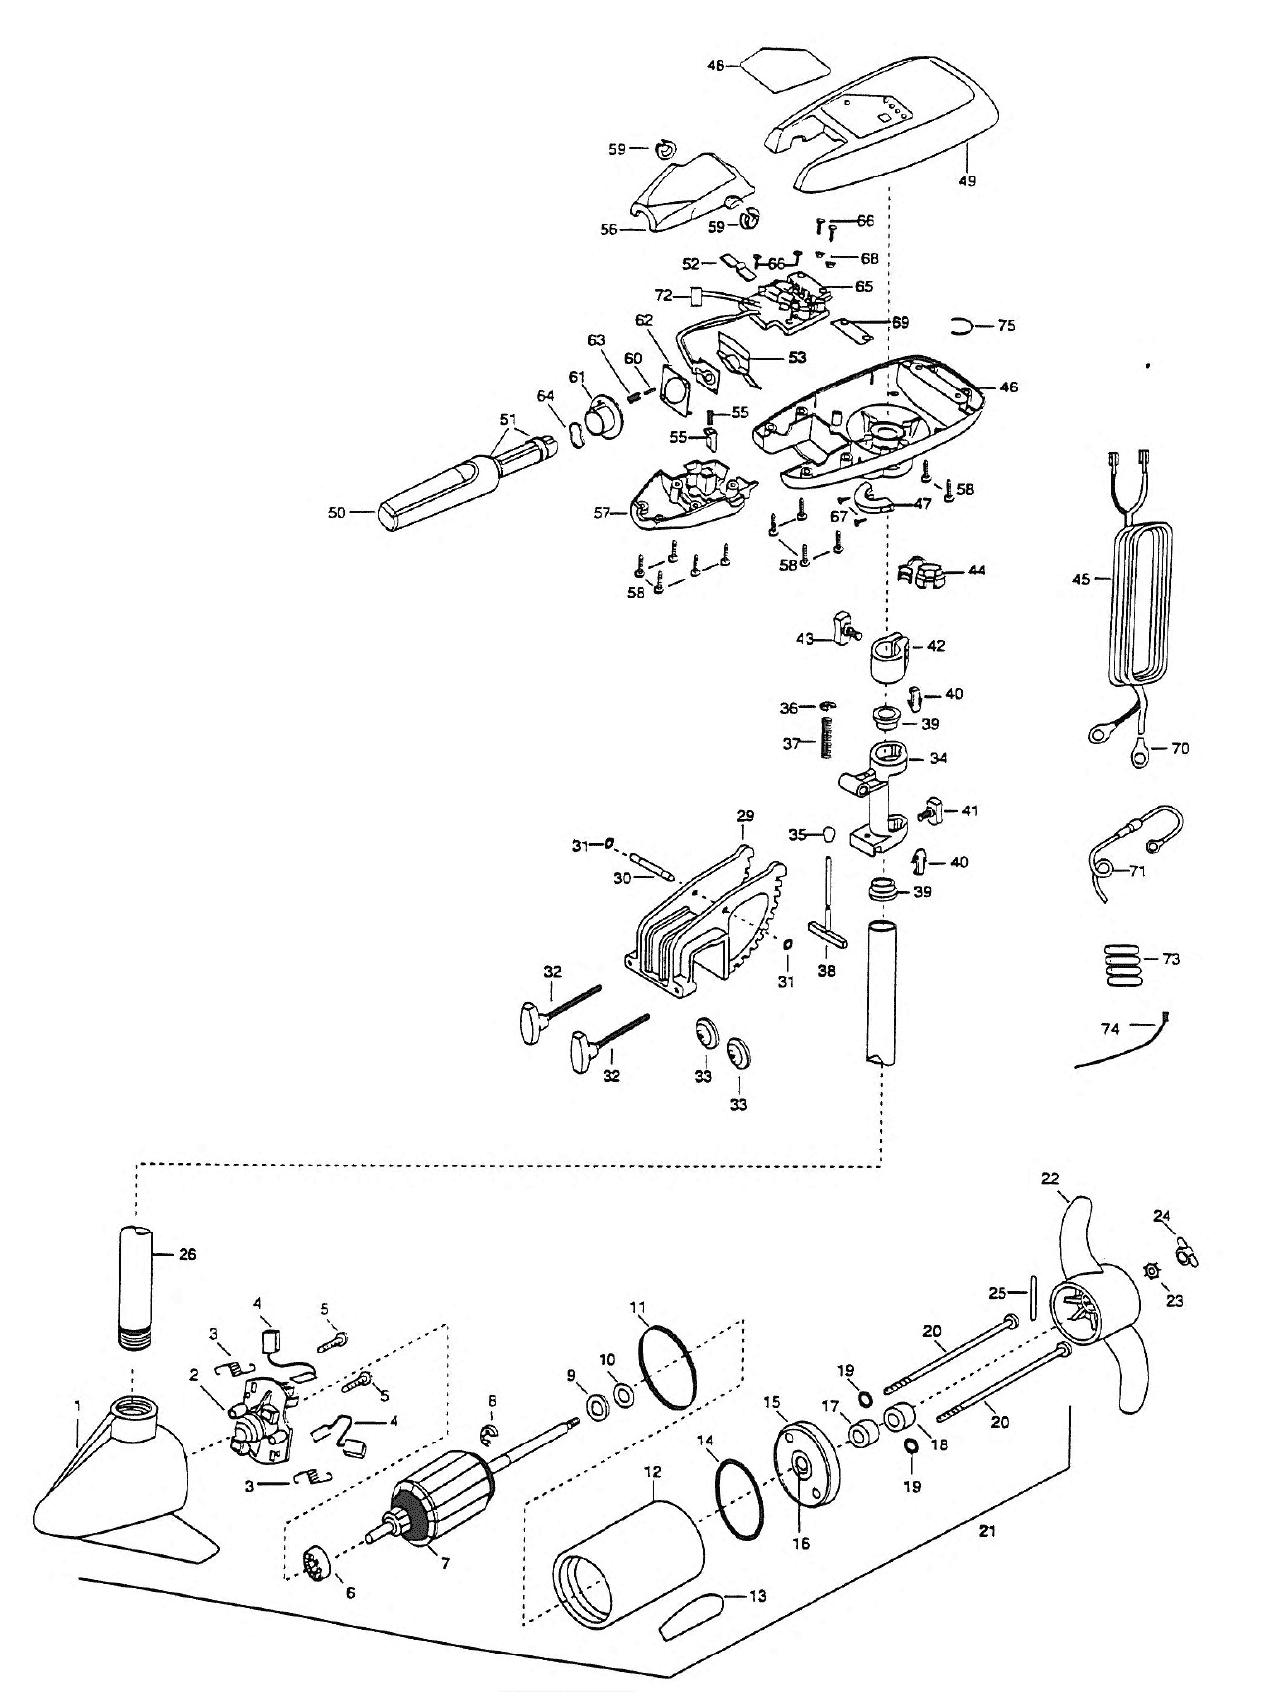 minn kota riptide 42s parts 1999 from fish307